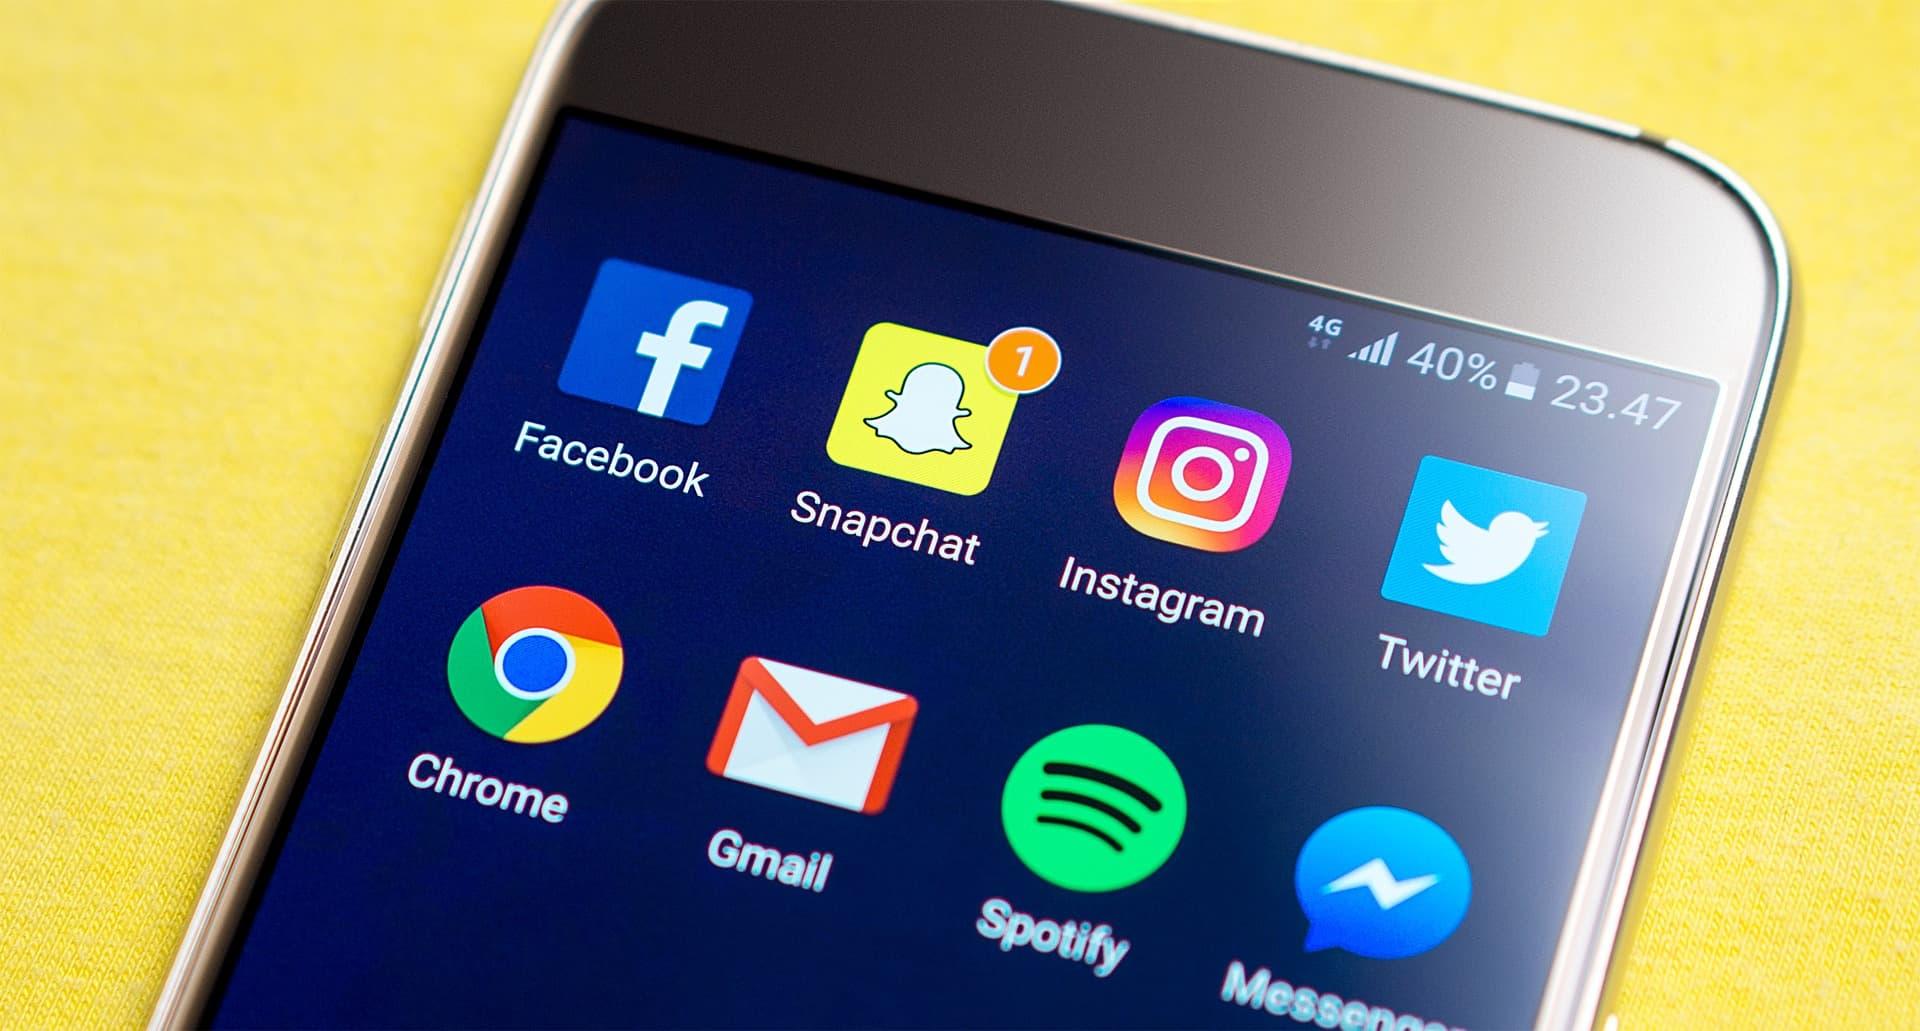 Snapchat's big gaming push might be right around the corner